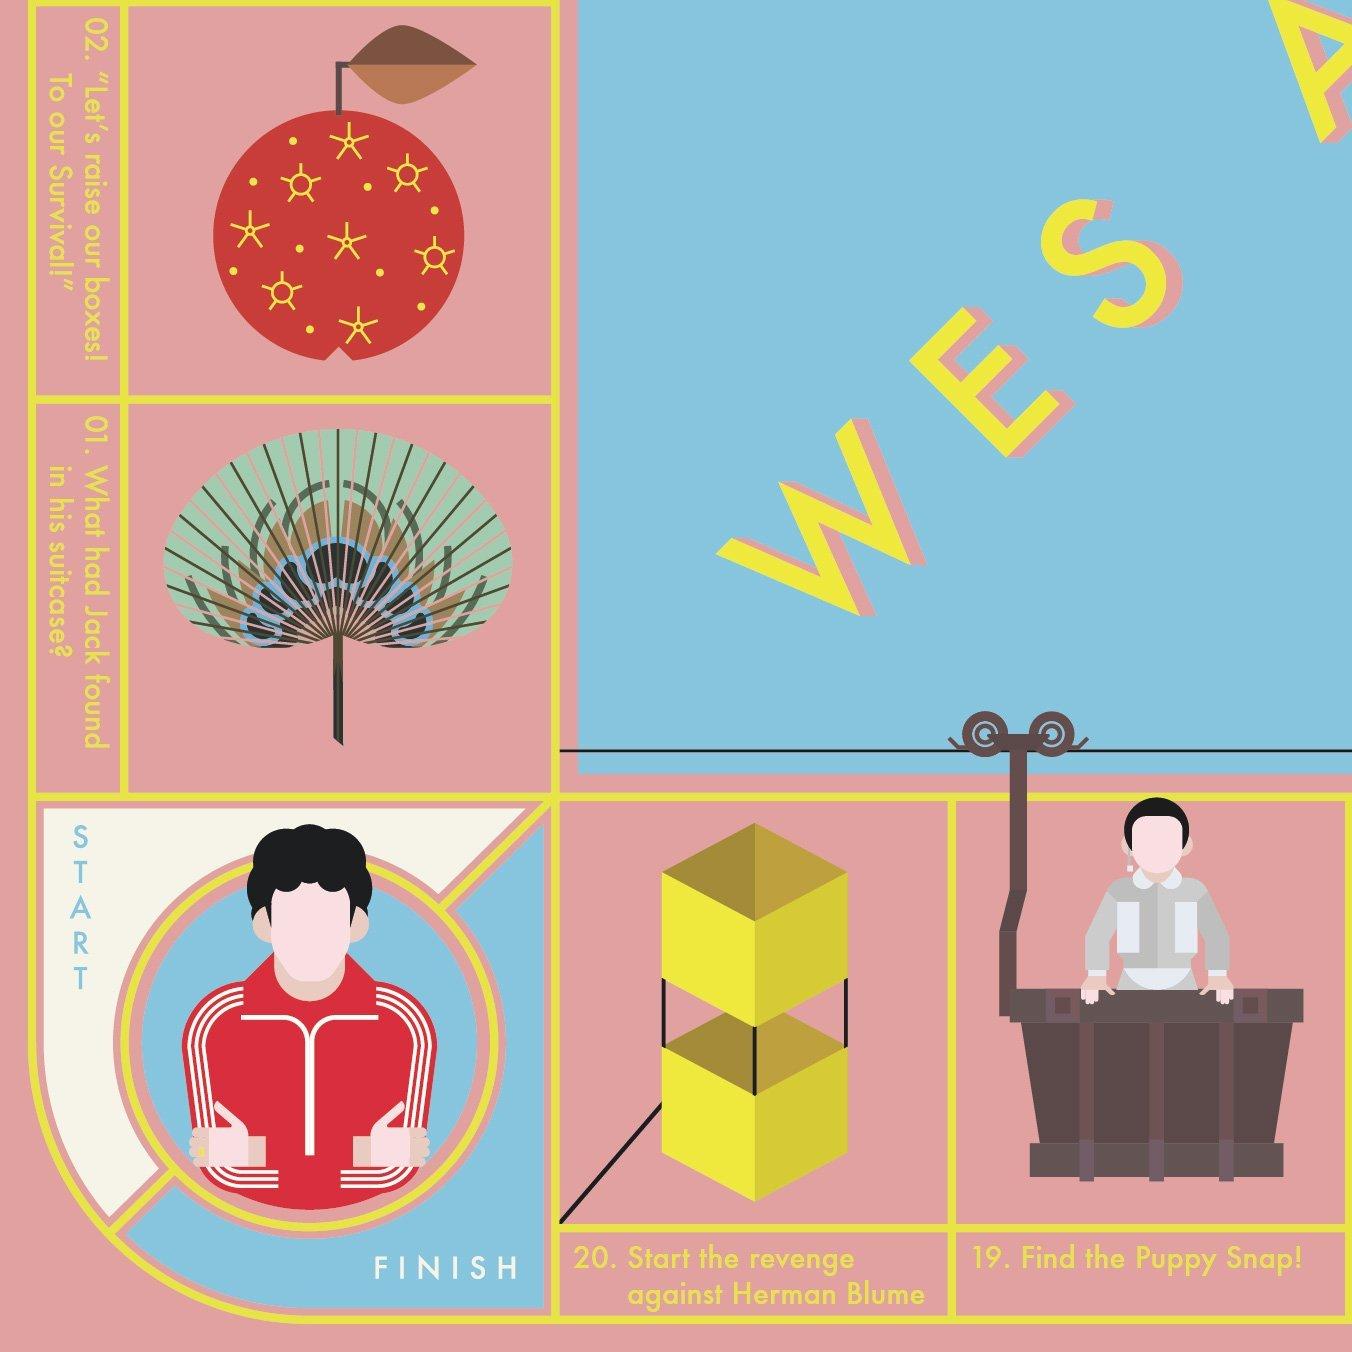 Wes-anderson-illustration-alice-iuri-2